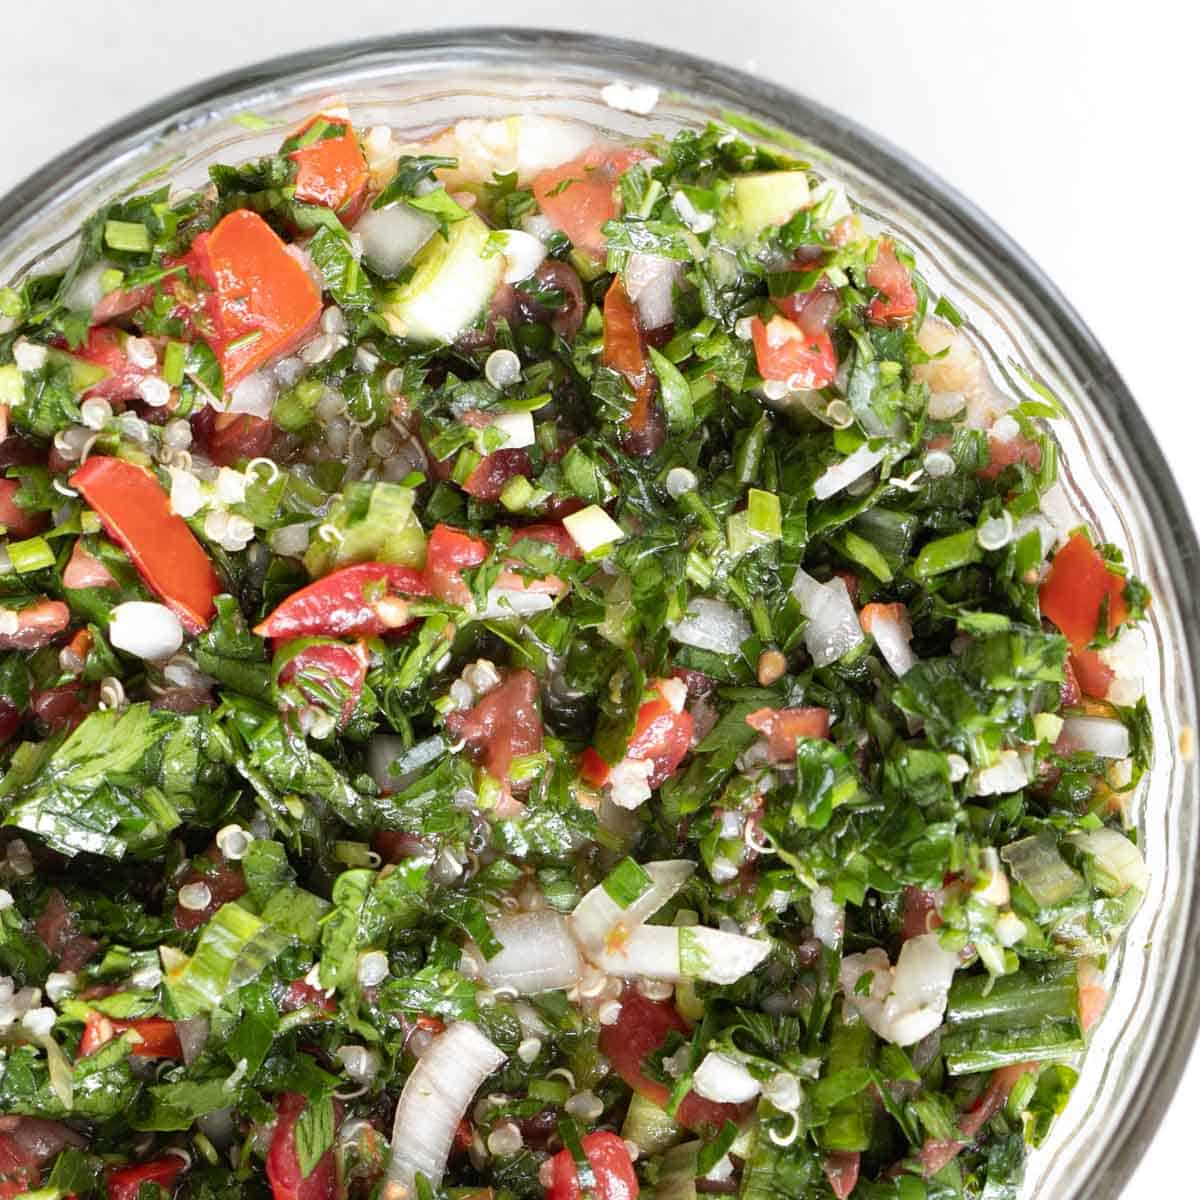 quinoa tabbouleh parsley salad close up